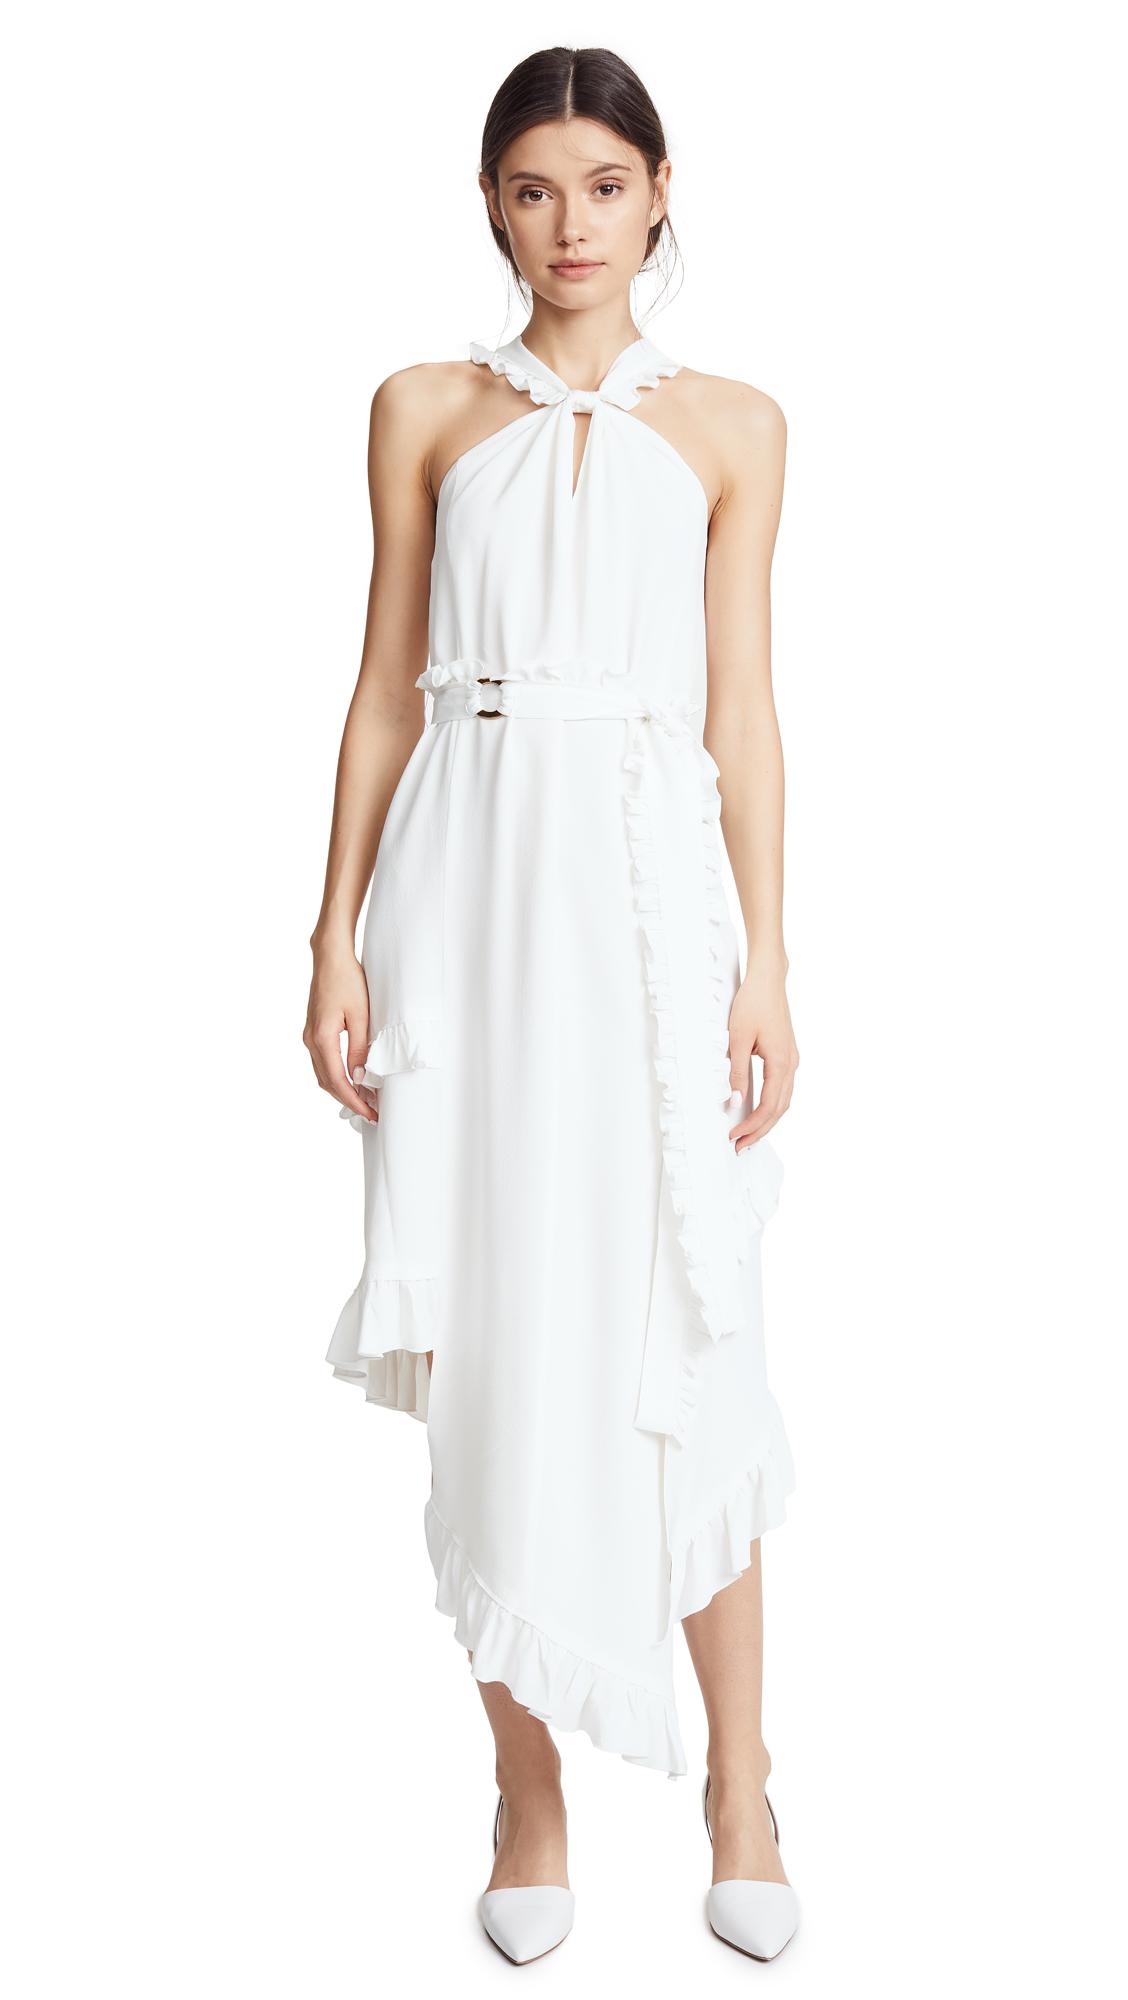 Derek Lam 10 Crosby Asymmetrical Halter Dress